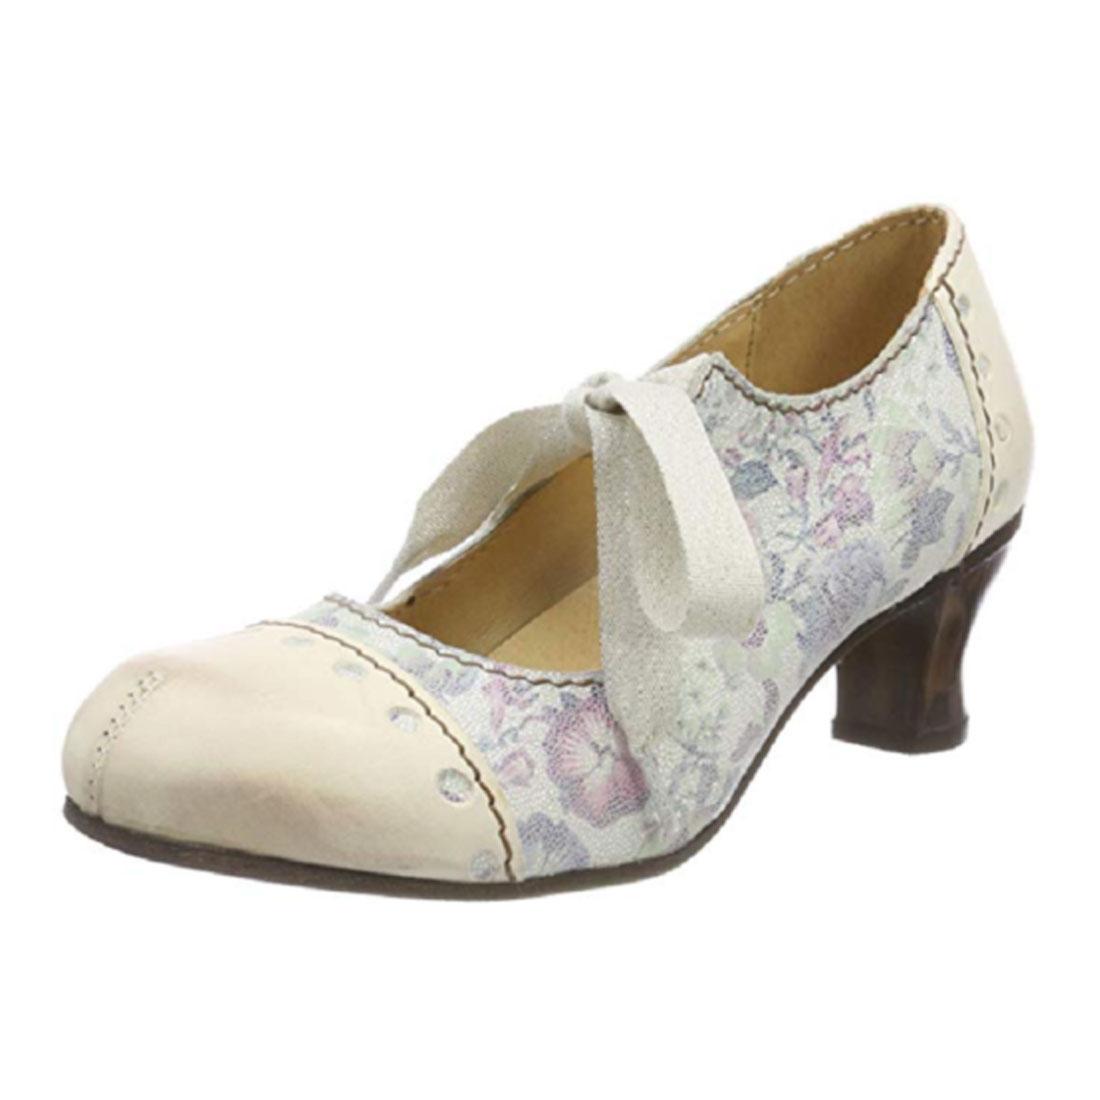 Rovers Schuhe Sale